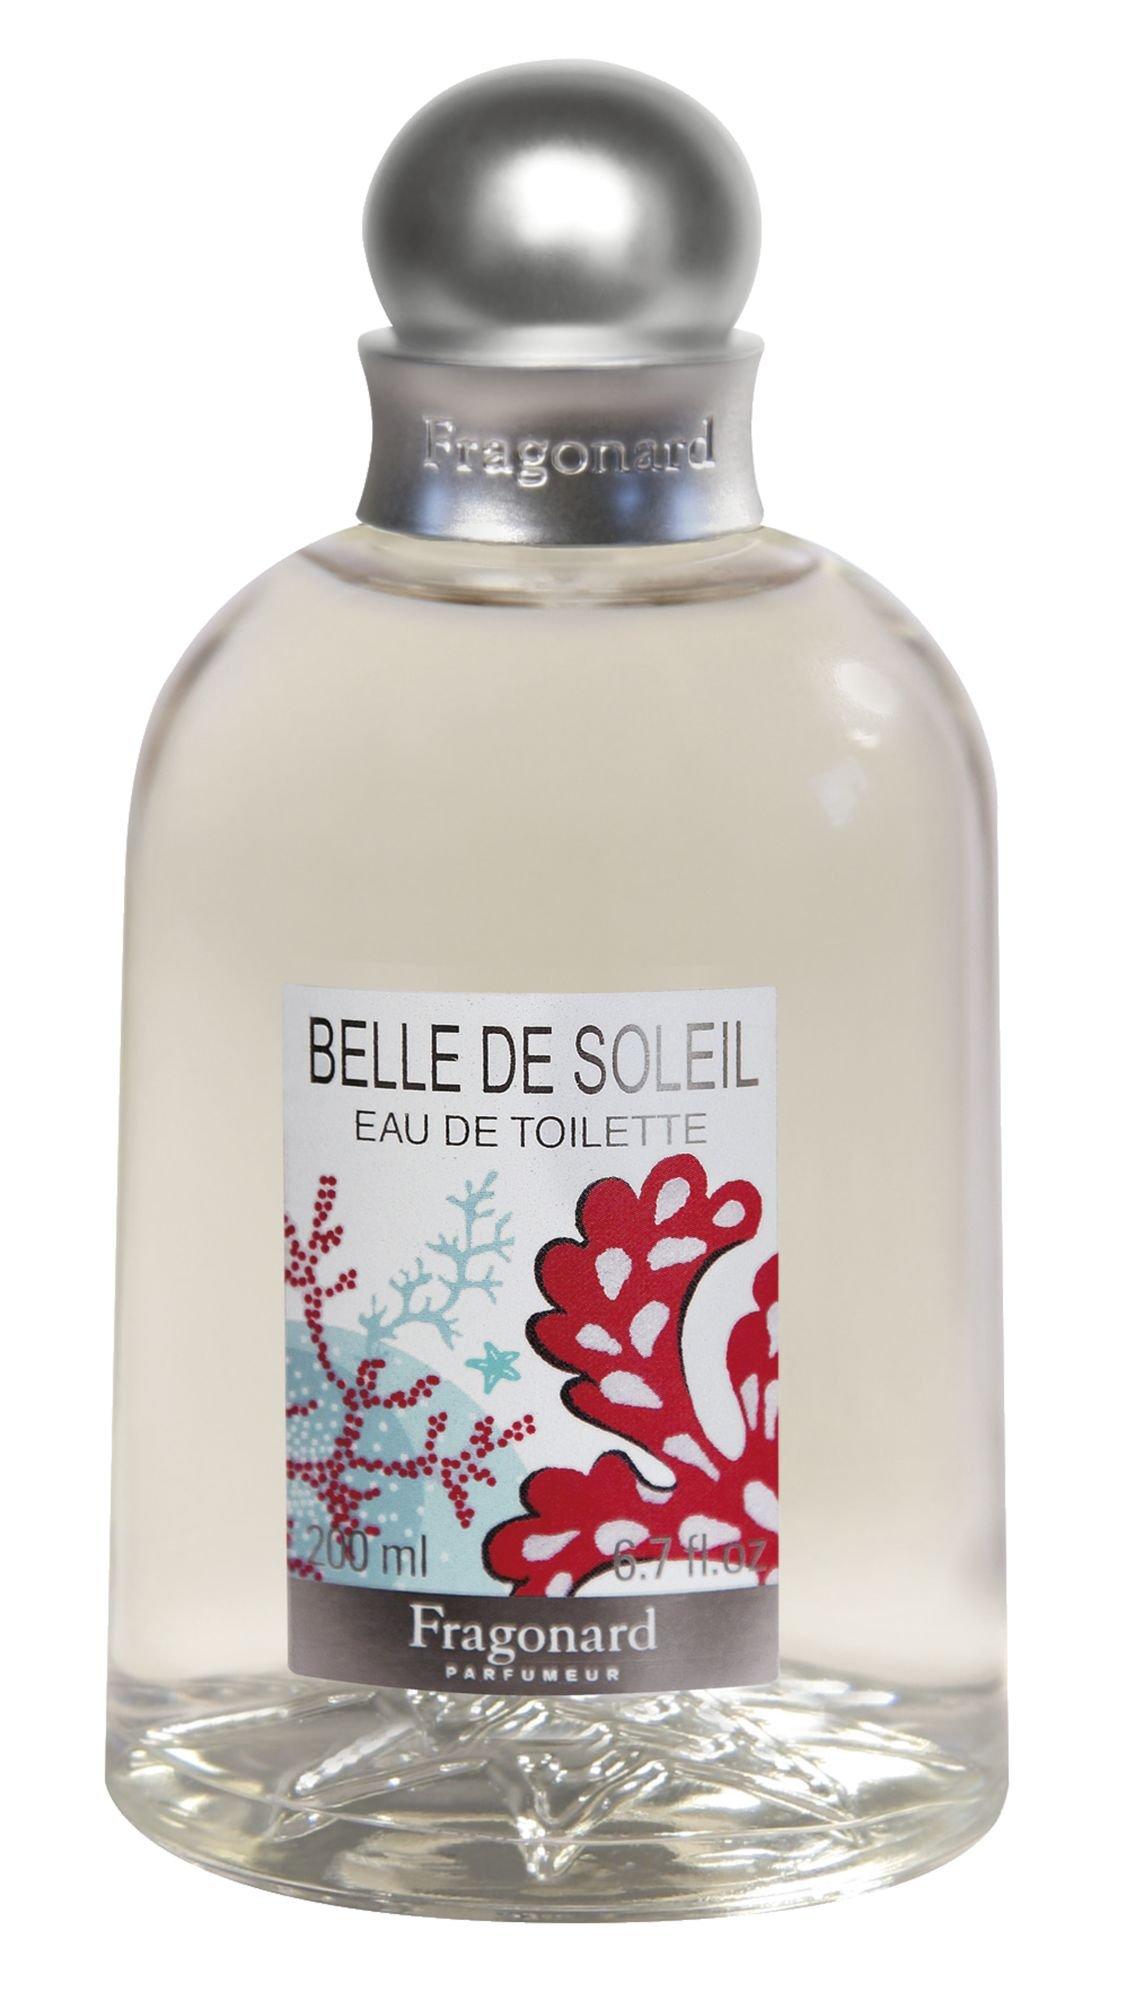 Belle de Soleil Fragonard for women